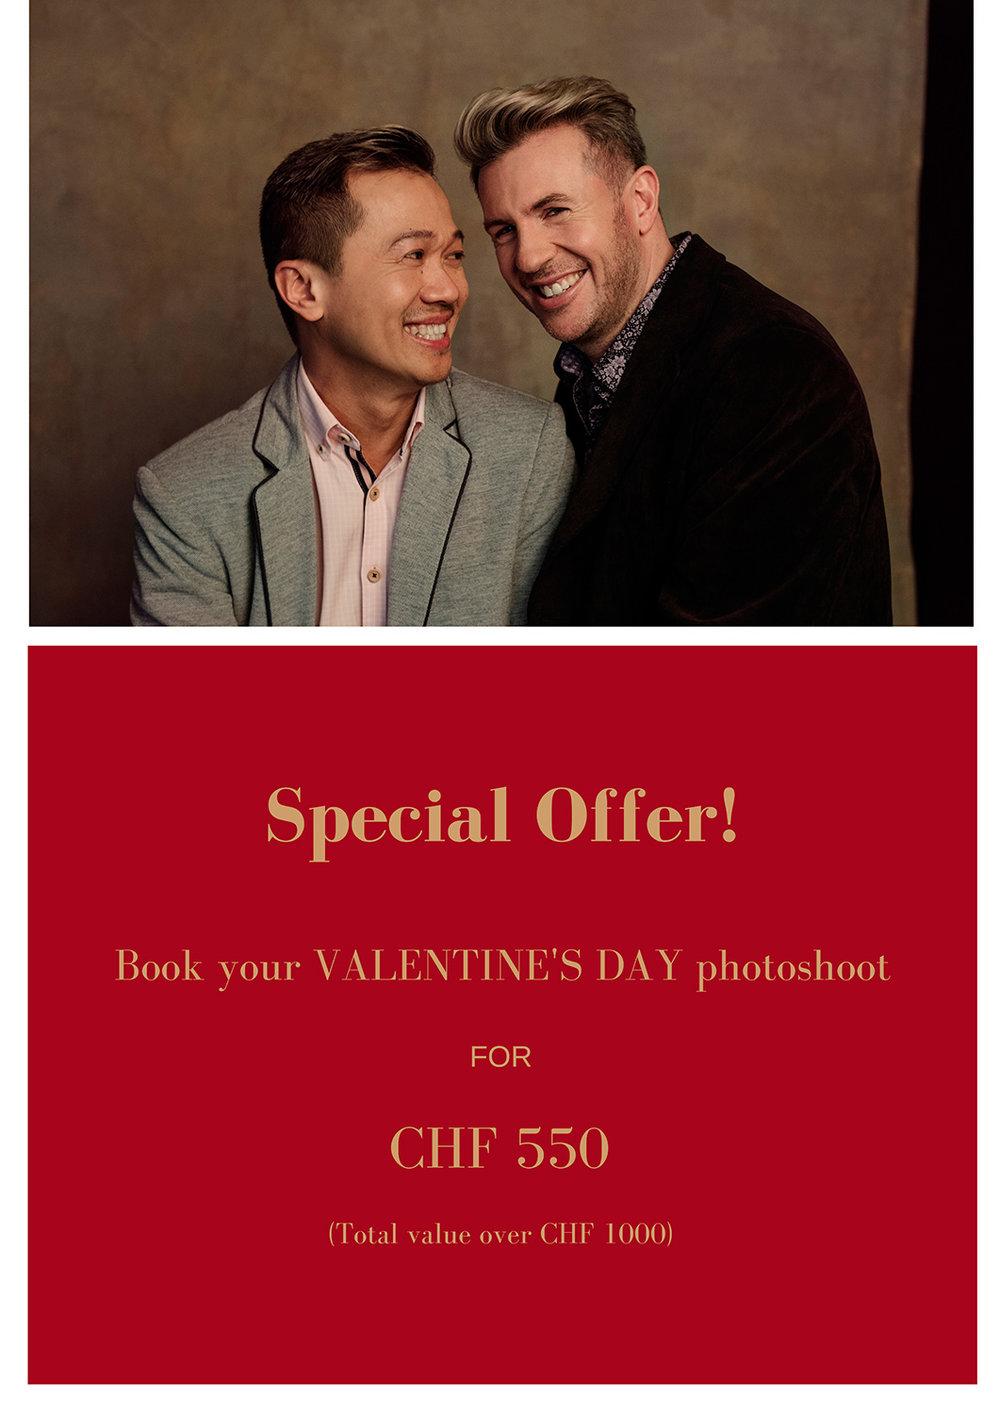 valentines-day-promo-5-web.jpg